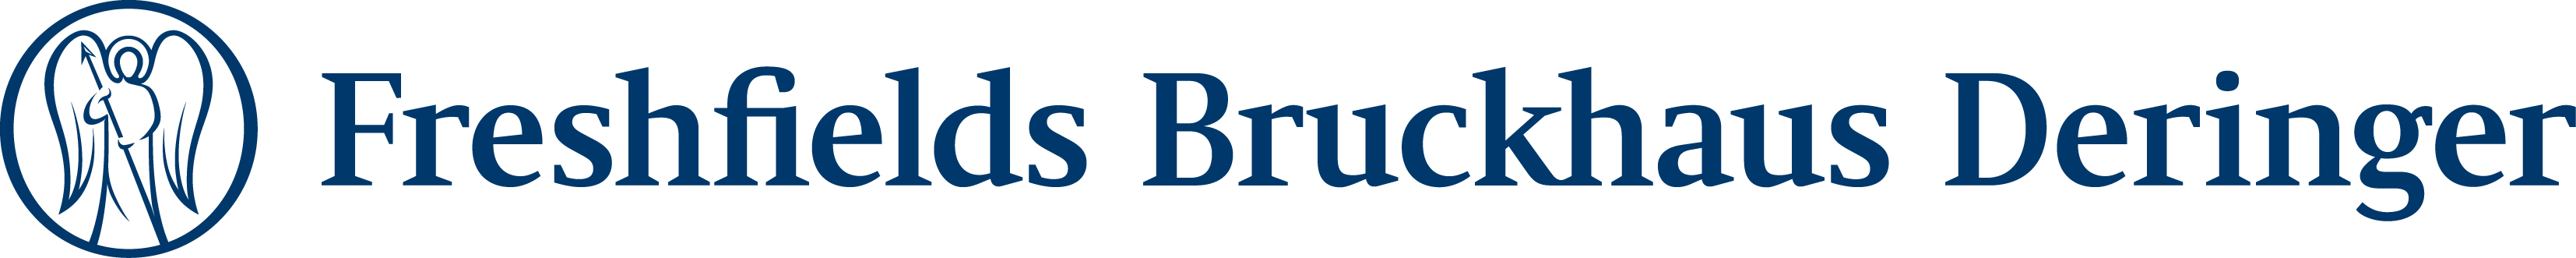 Freshlieds Bruckhaus Deringer